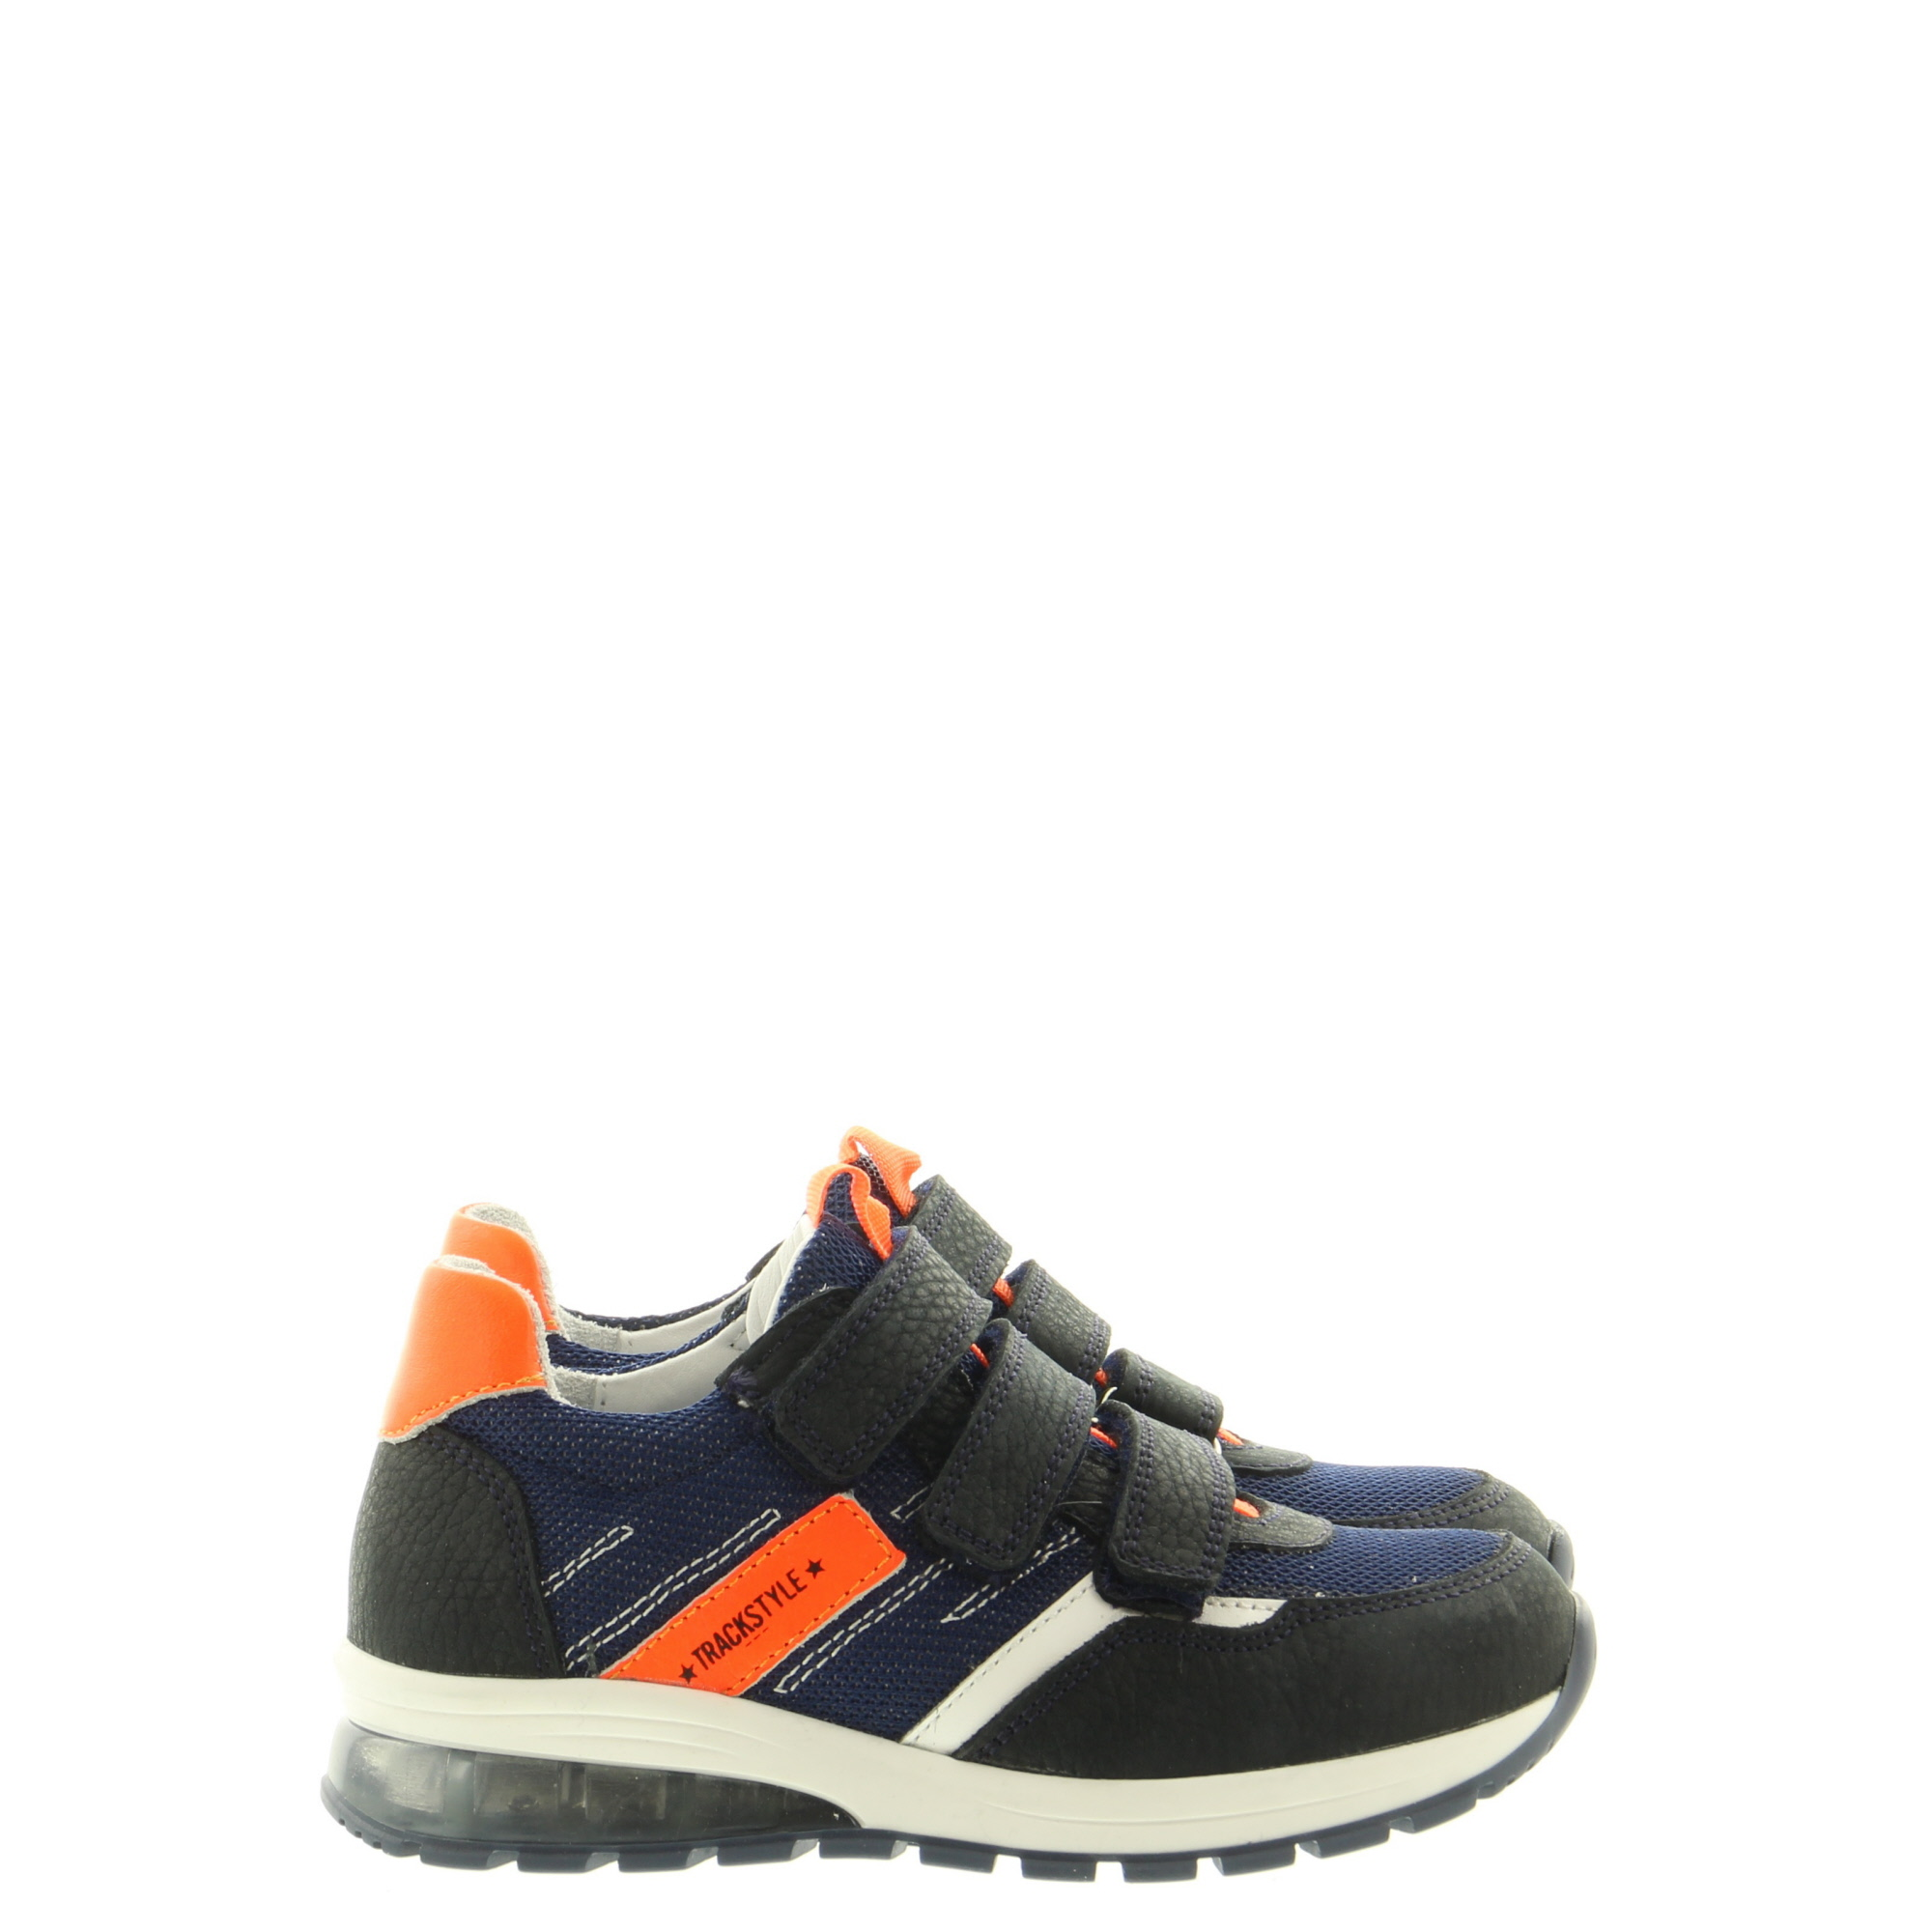 Twins Trackstyle 321351 129 D.Blue Orange